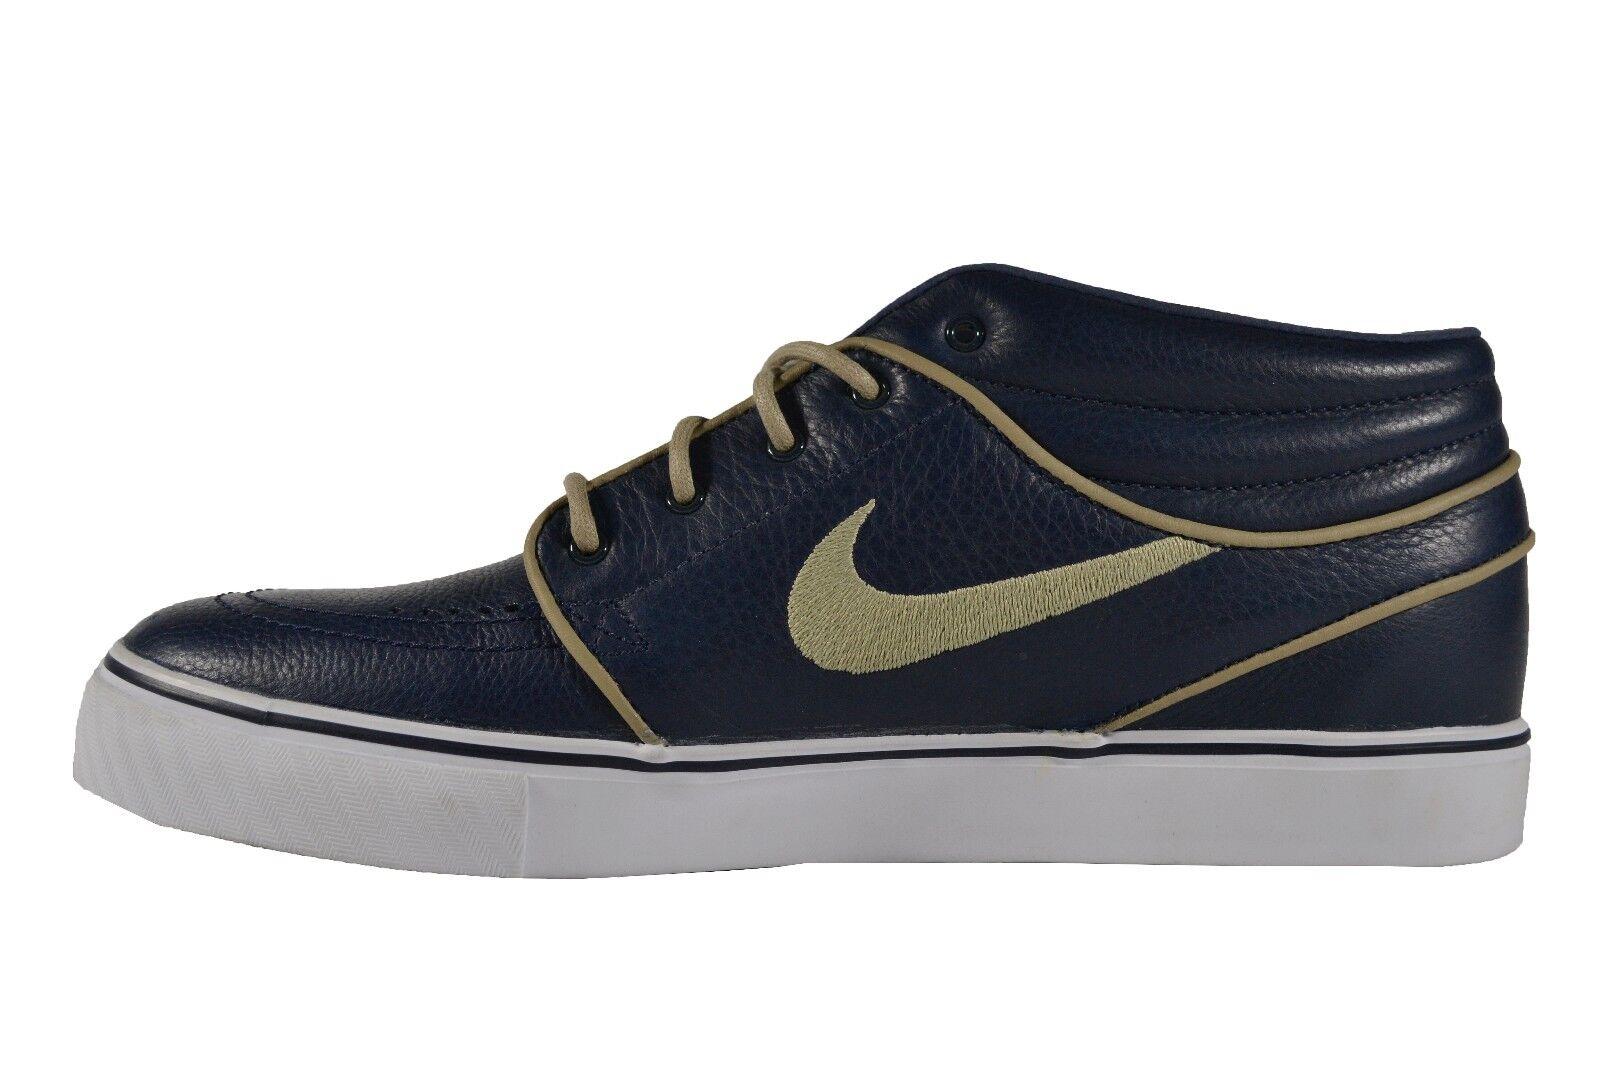 Nike Nike Nike zoom stefan janoski md pr - marine khaki - kaugummi hellbraune schuhe (185) 9d7005